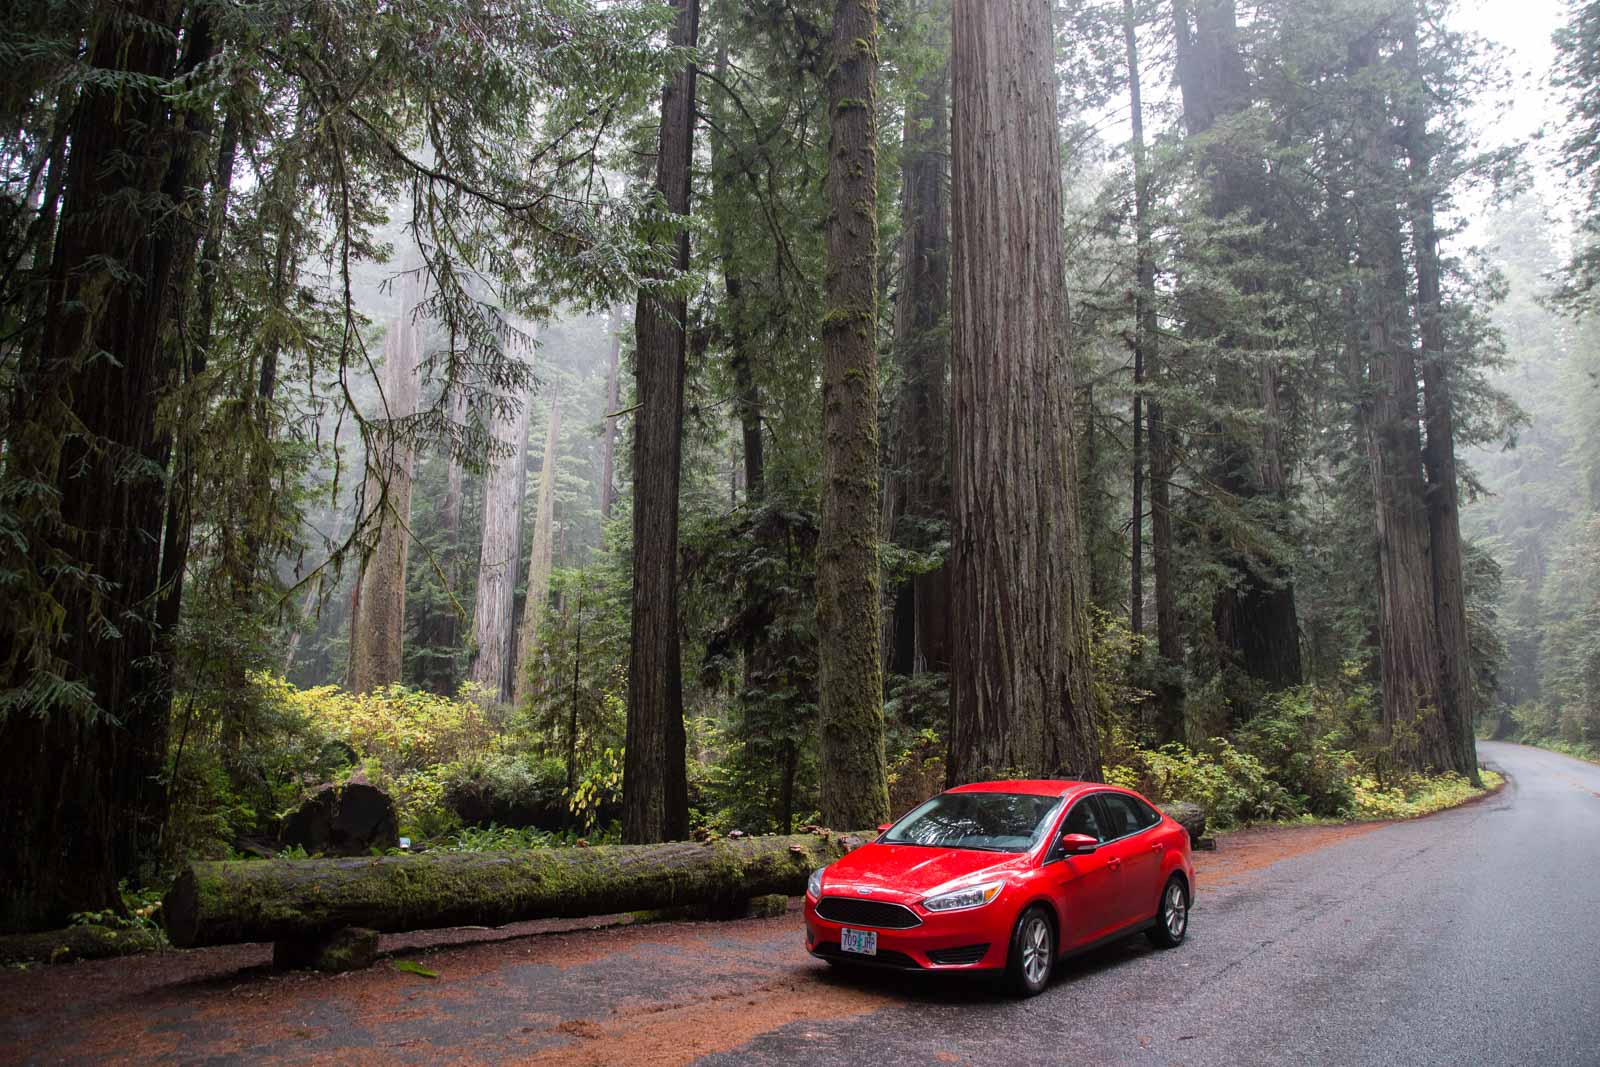 Roadtripping through Redwoods, West Coast USA